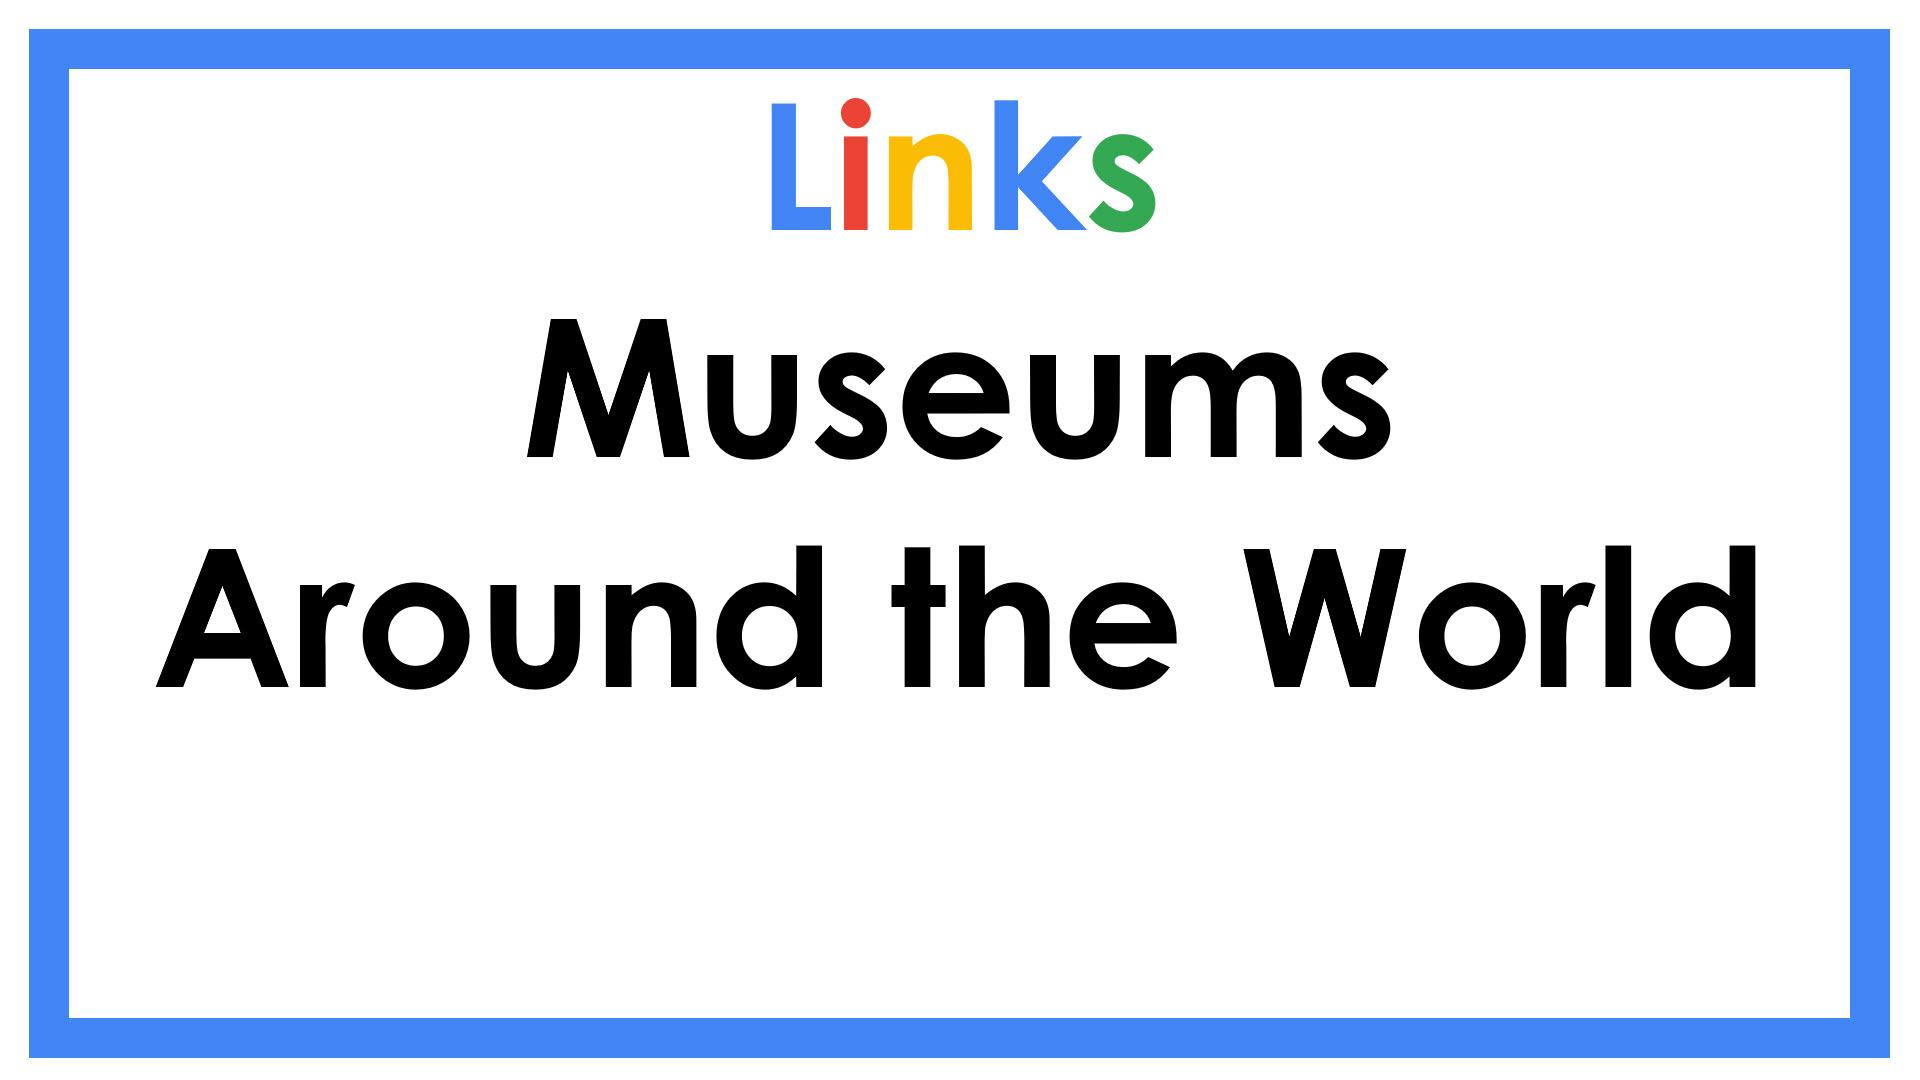 Links Museums Around the World